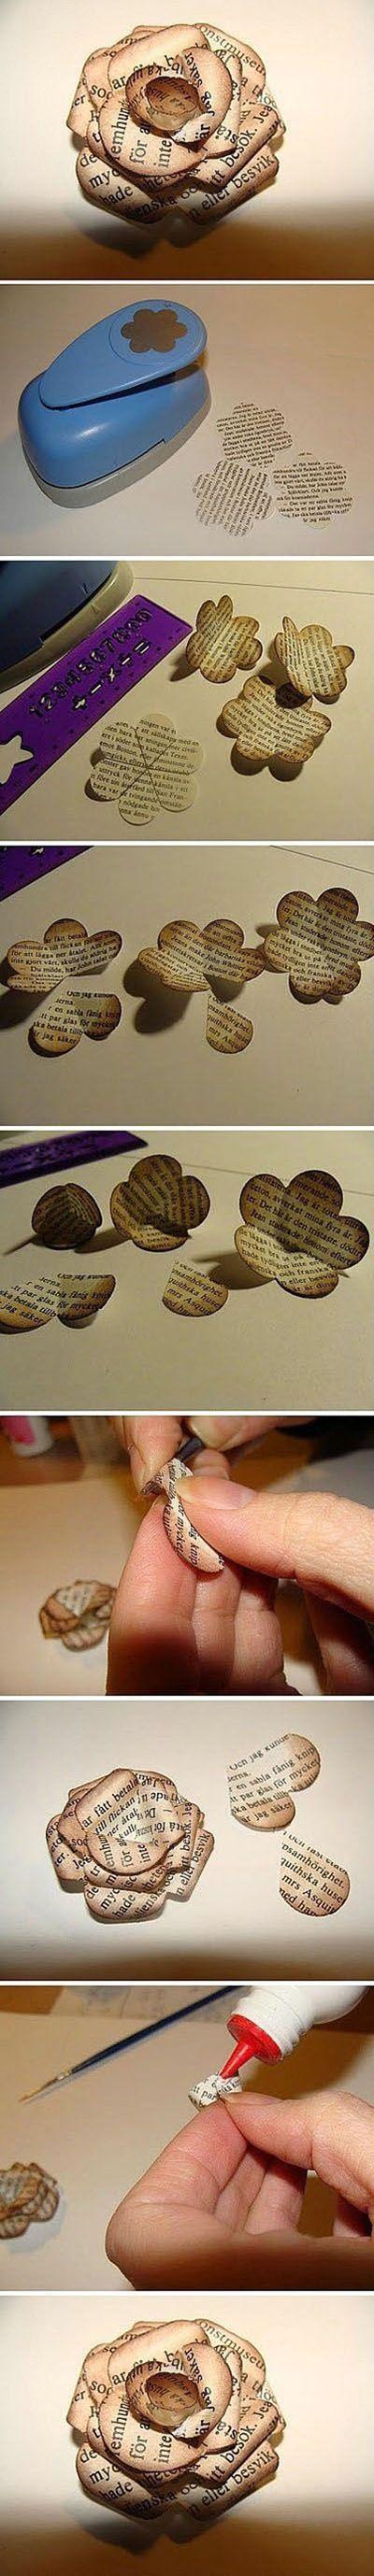 So Beautiful Rose | DIY & Crafts Tutorials